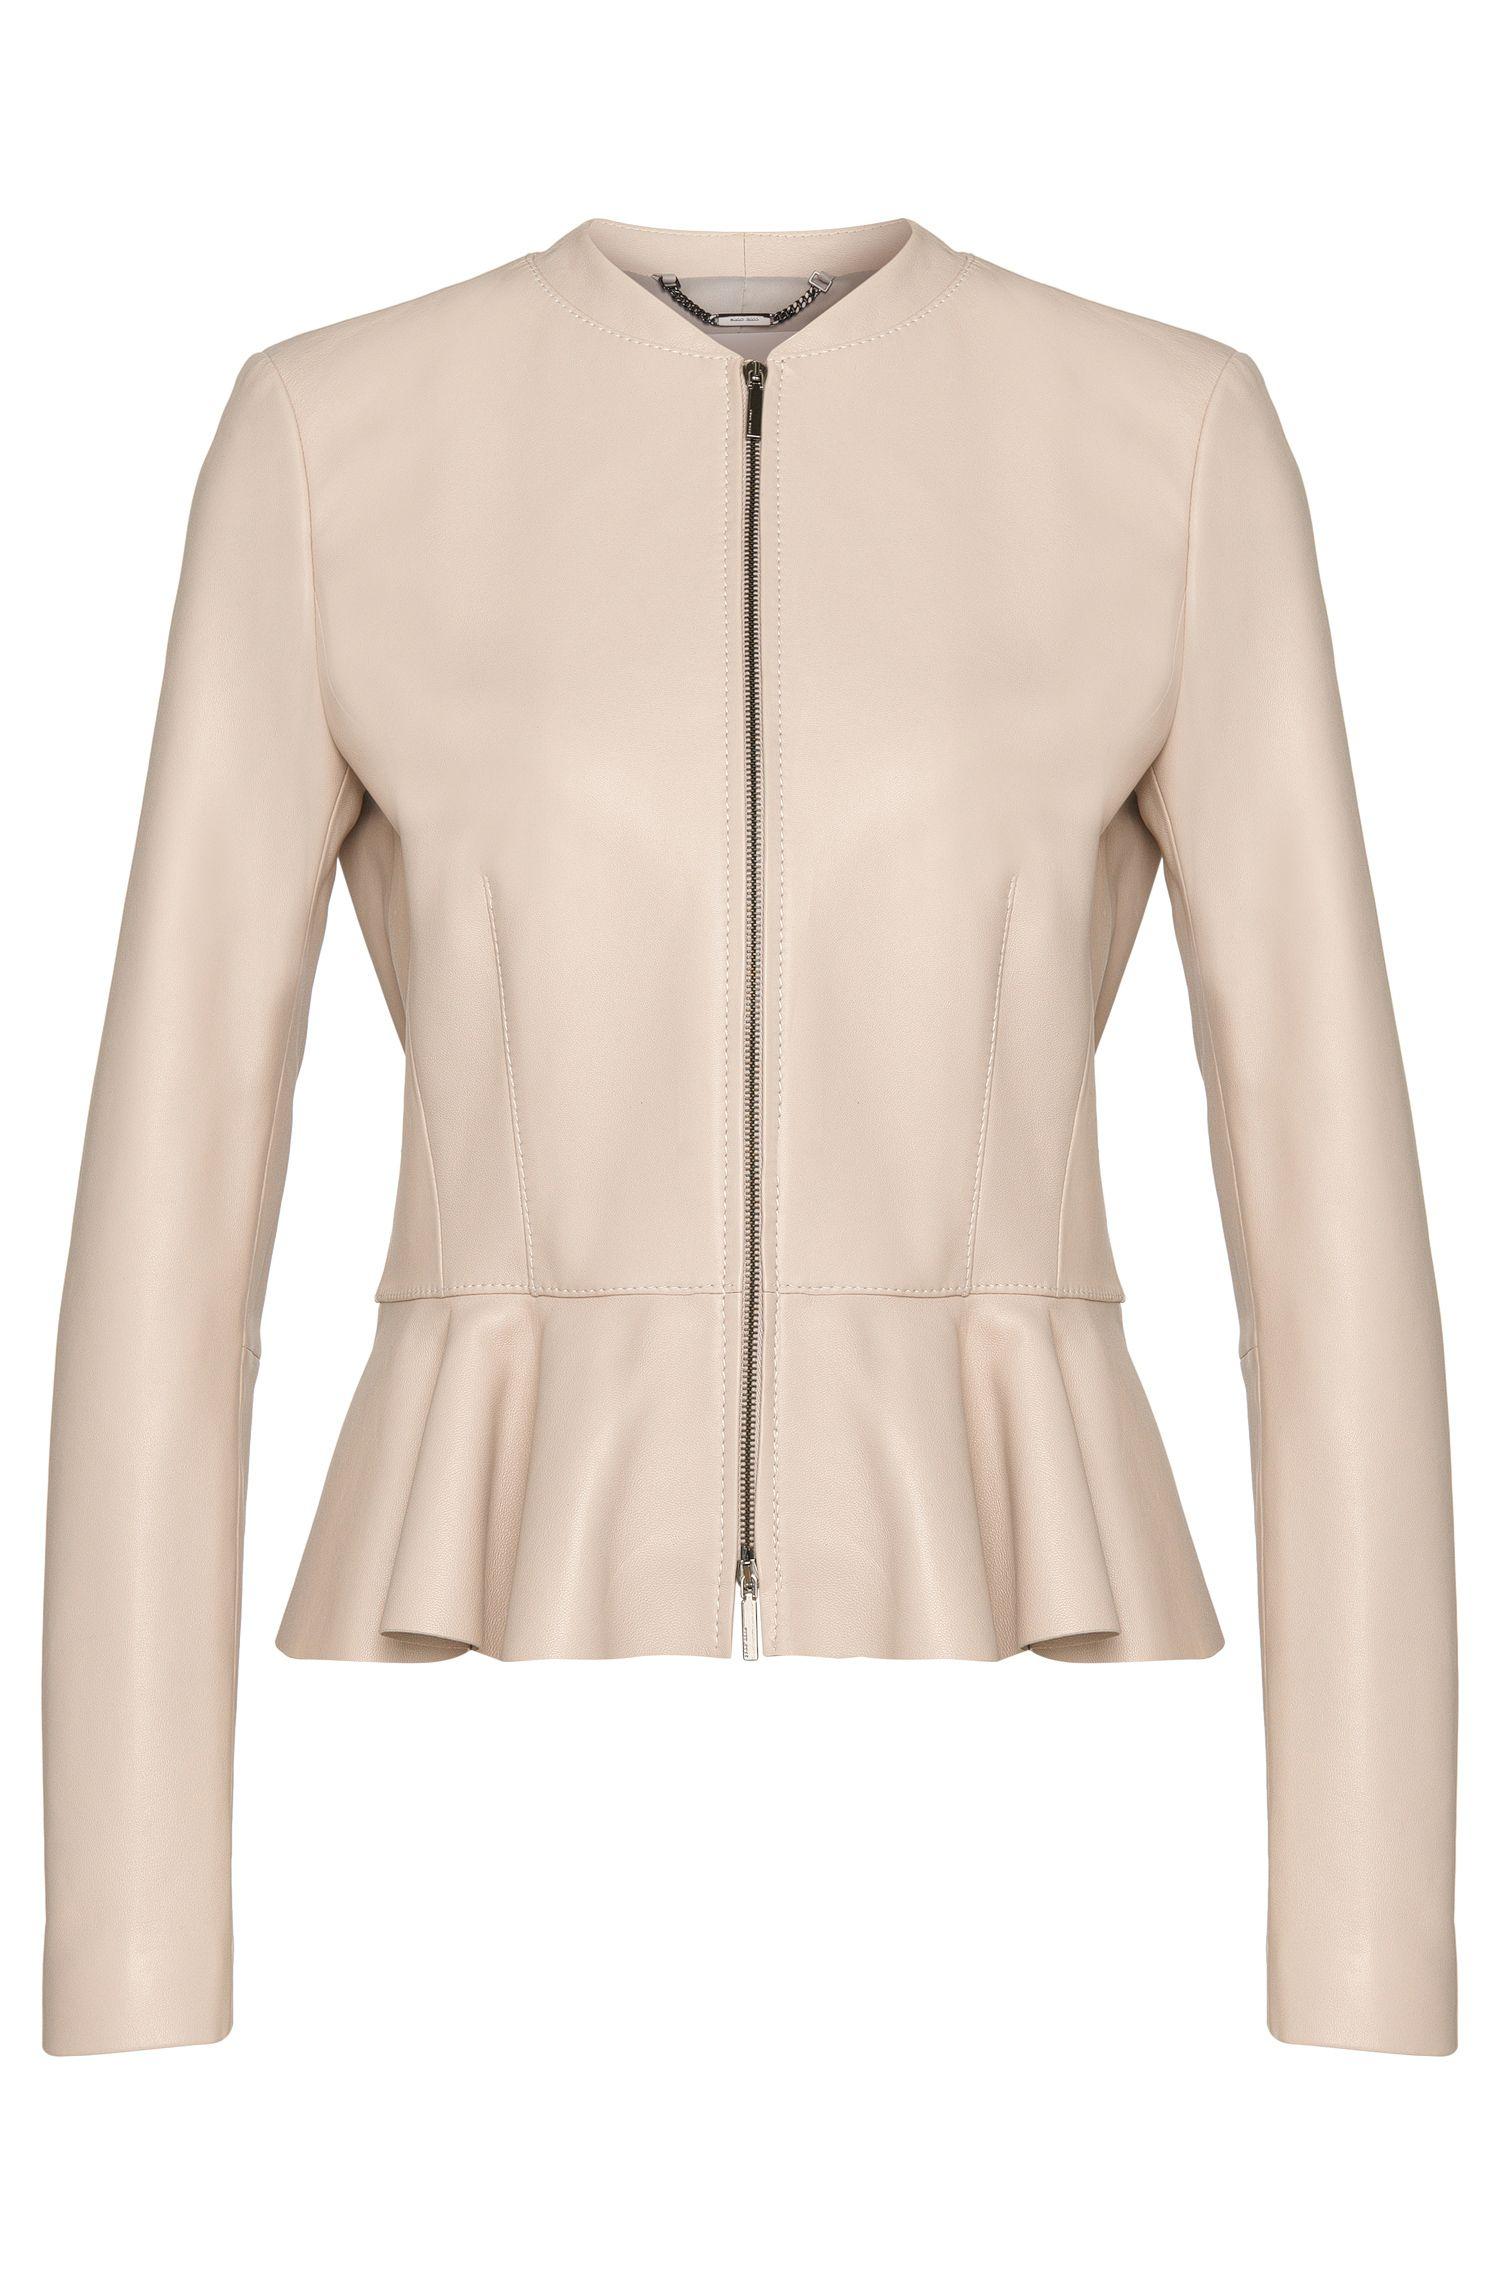 'Safisse' | Lambskin Peplum Leather Jacket